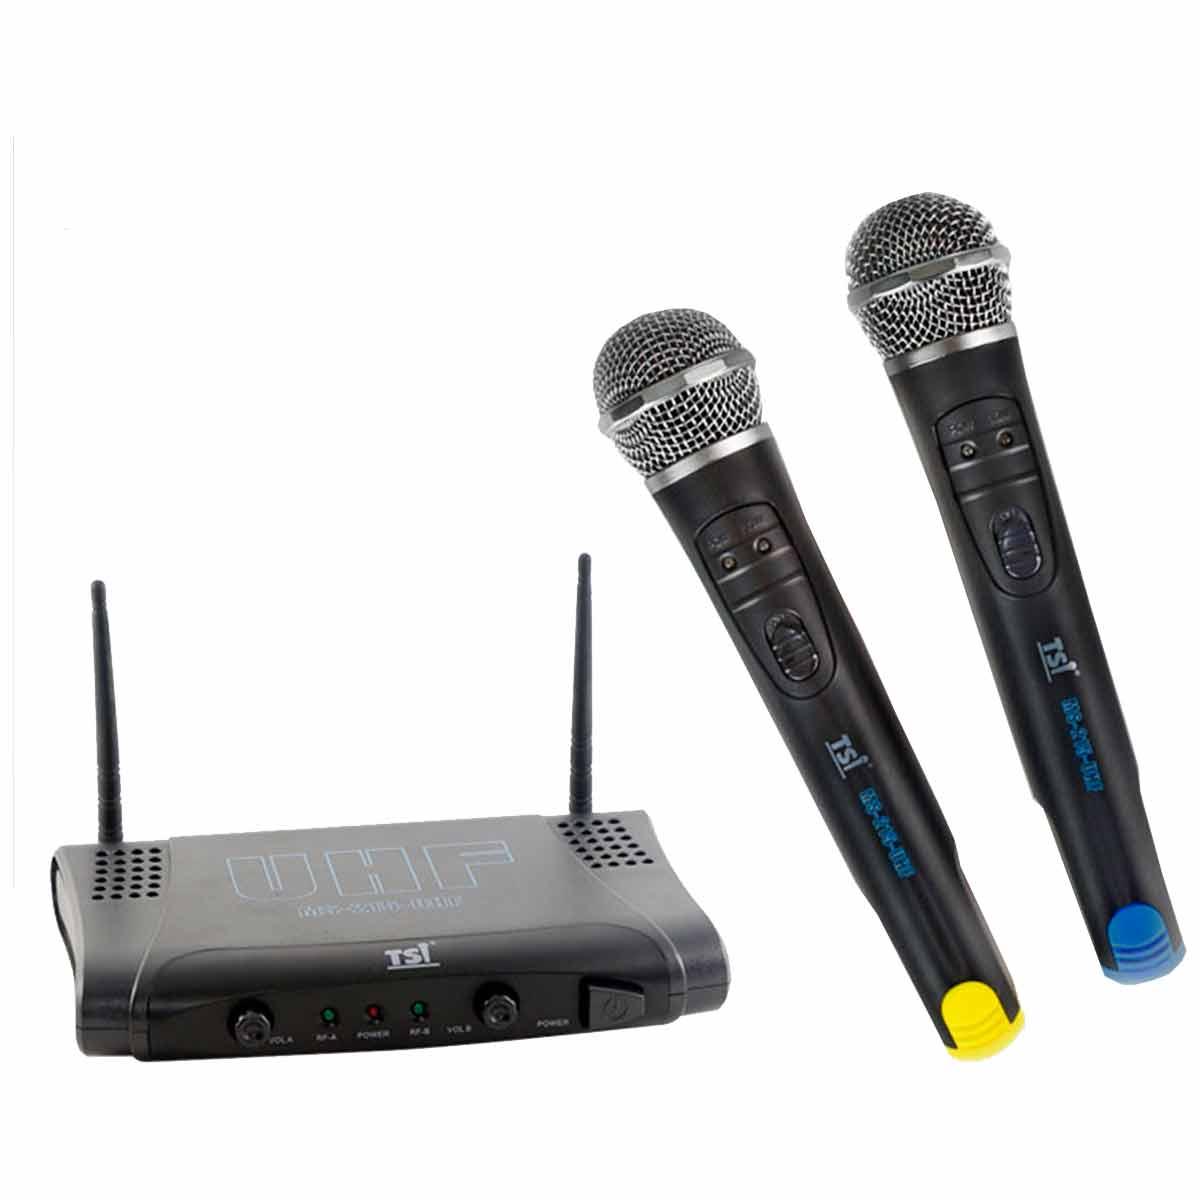 Microfone s/ Fio de Mão Duplo UHF MS-215-UHF - TSI